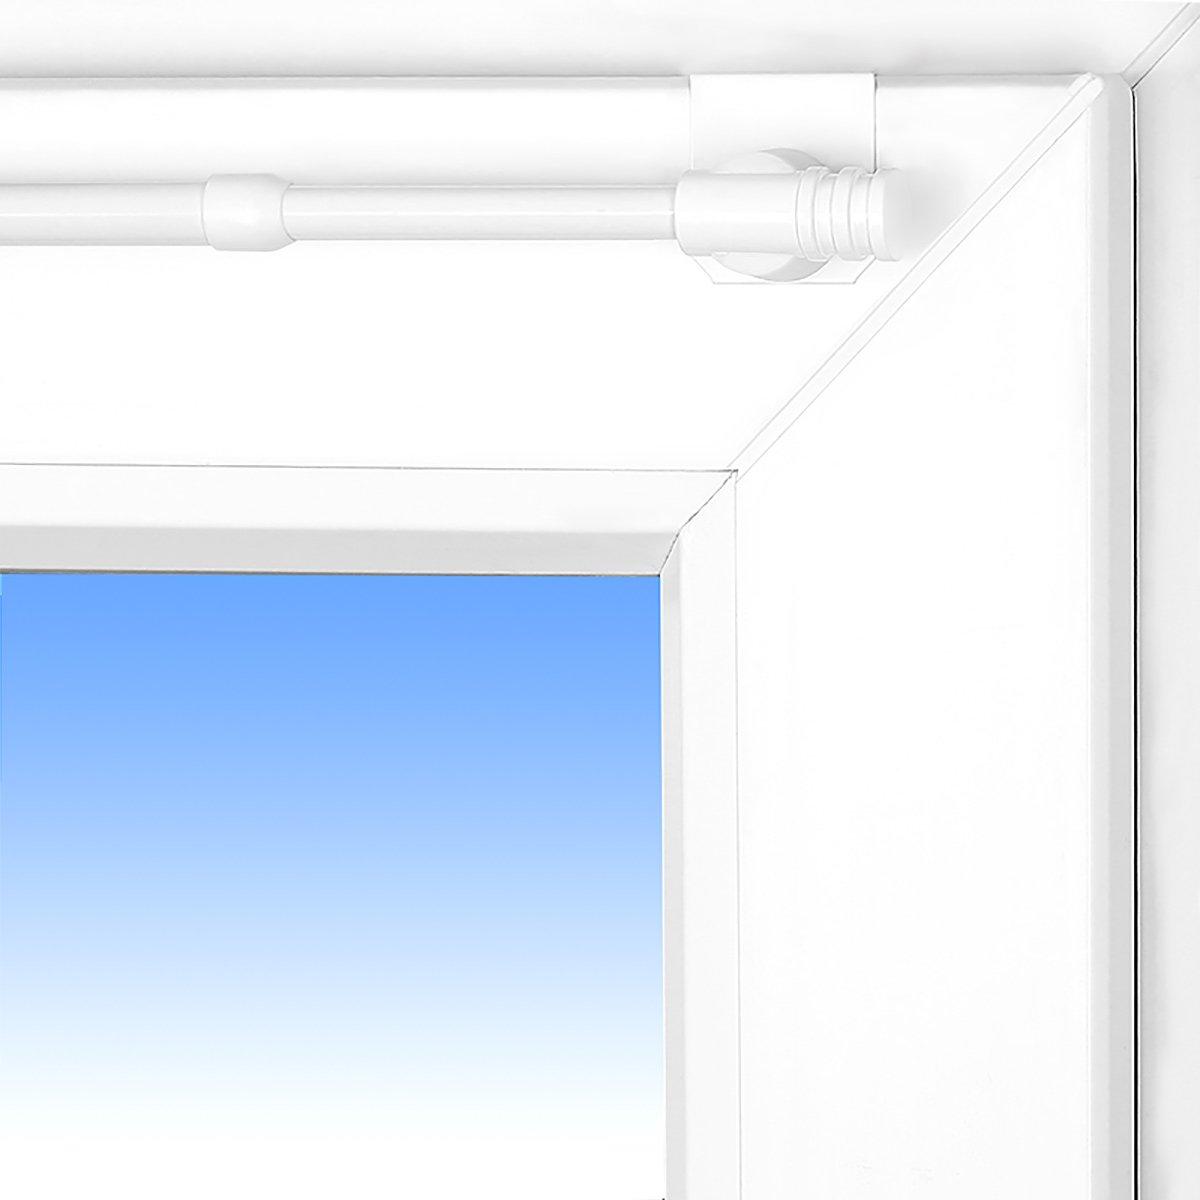 Asta allungabile per tende Basic Fix-Klick 55-80 cm colore bianco asta bloccabile Spannfix universale